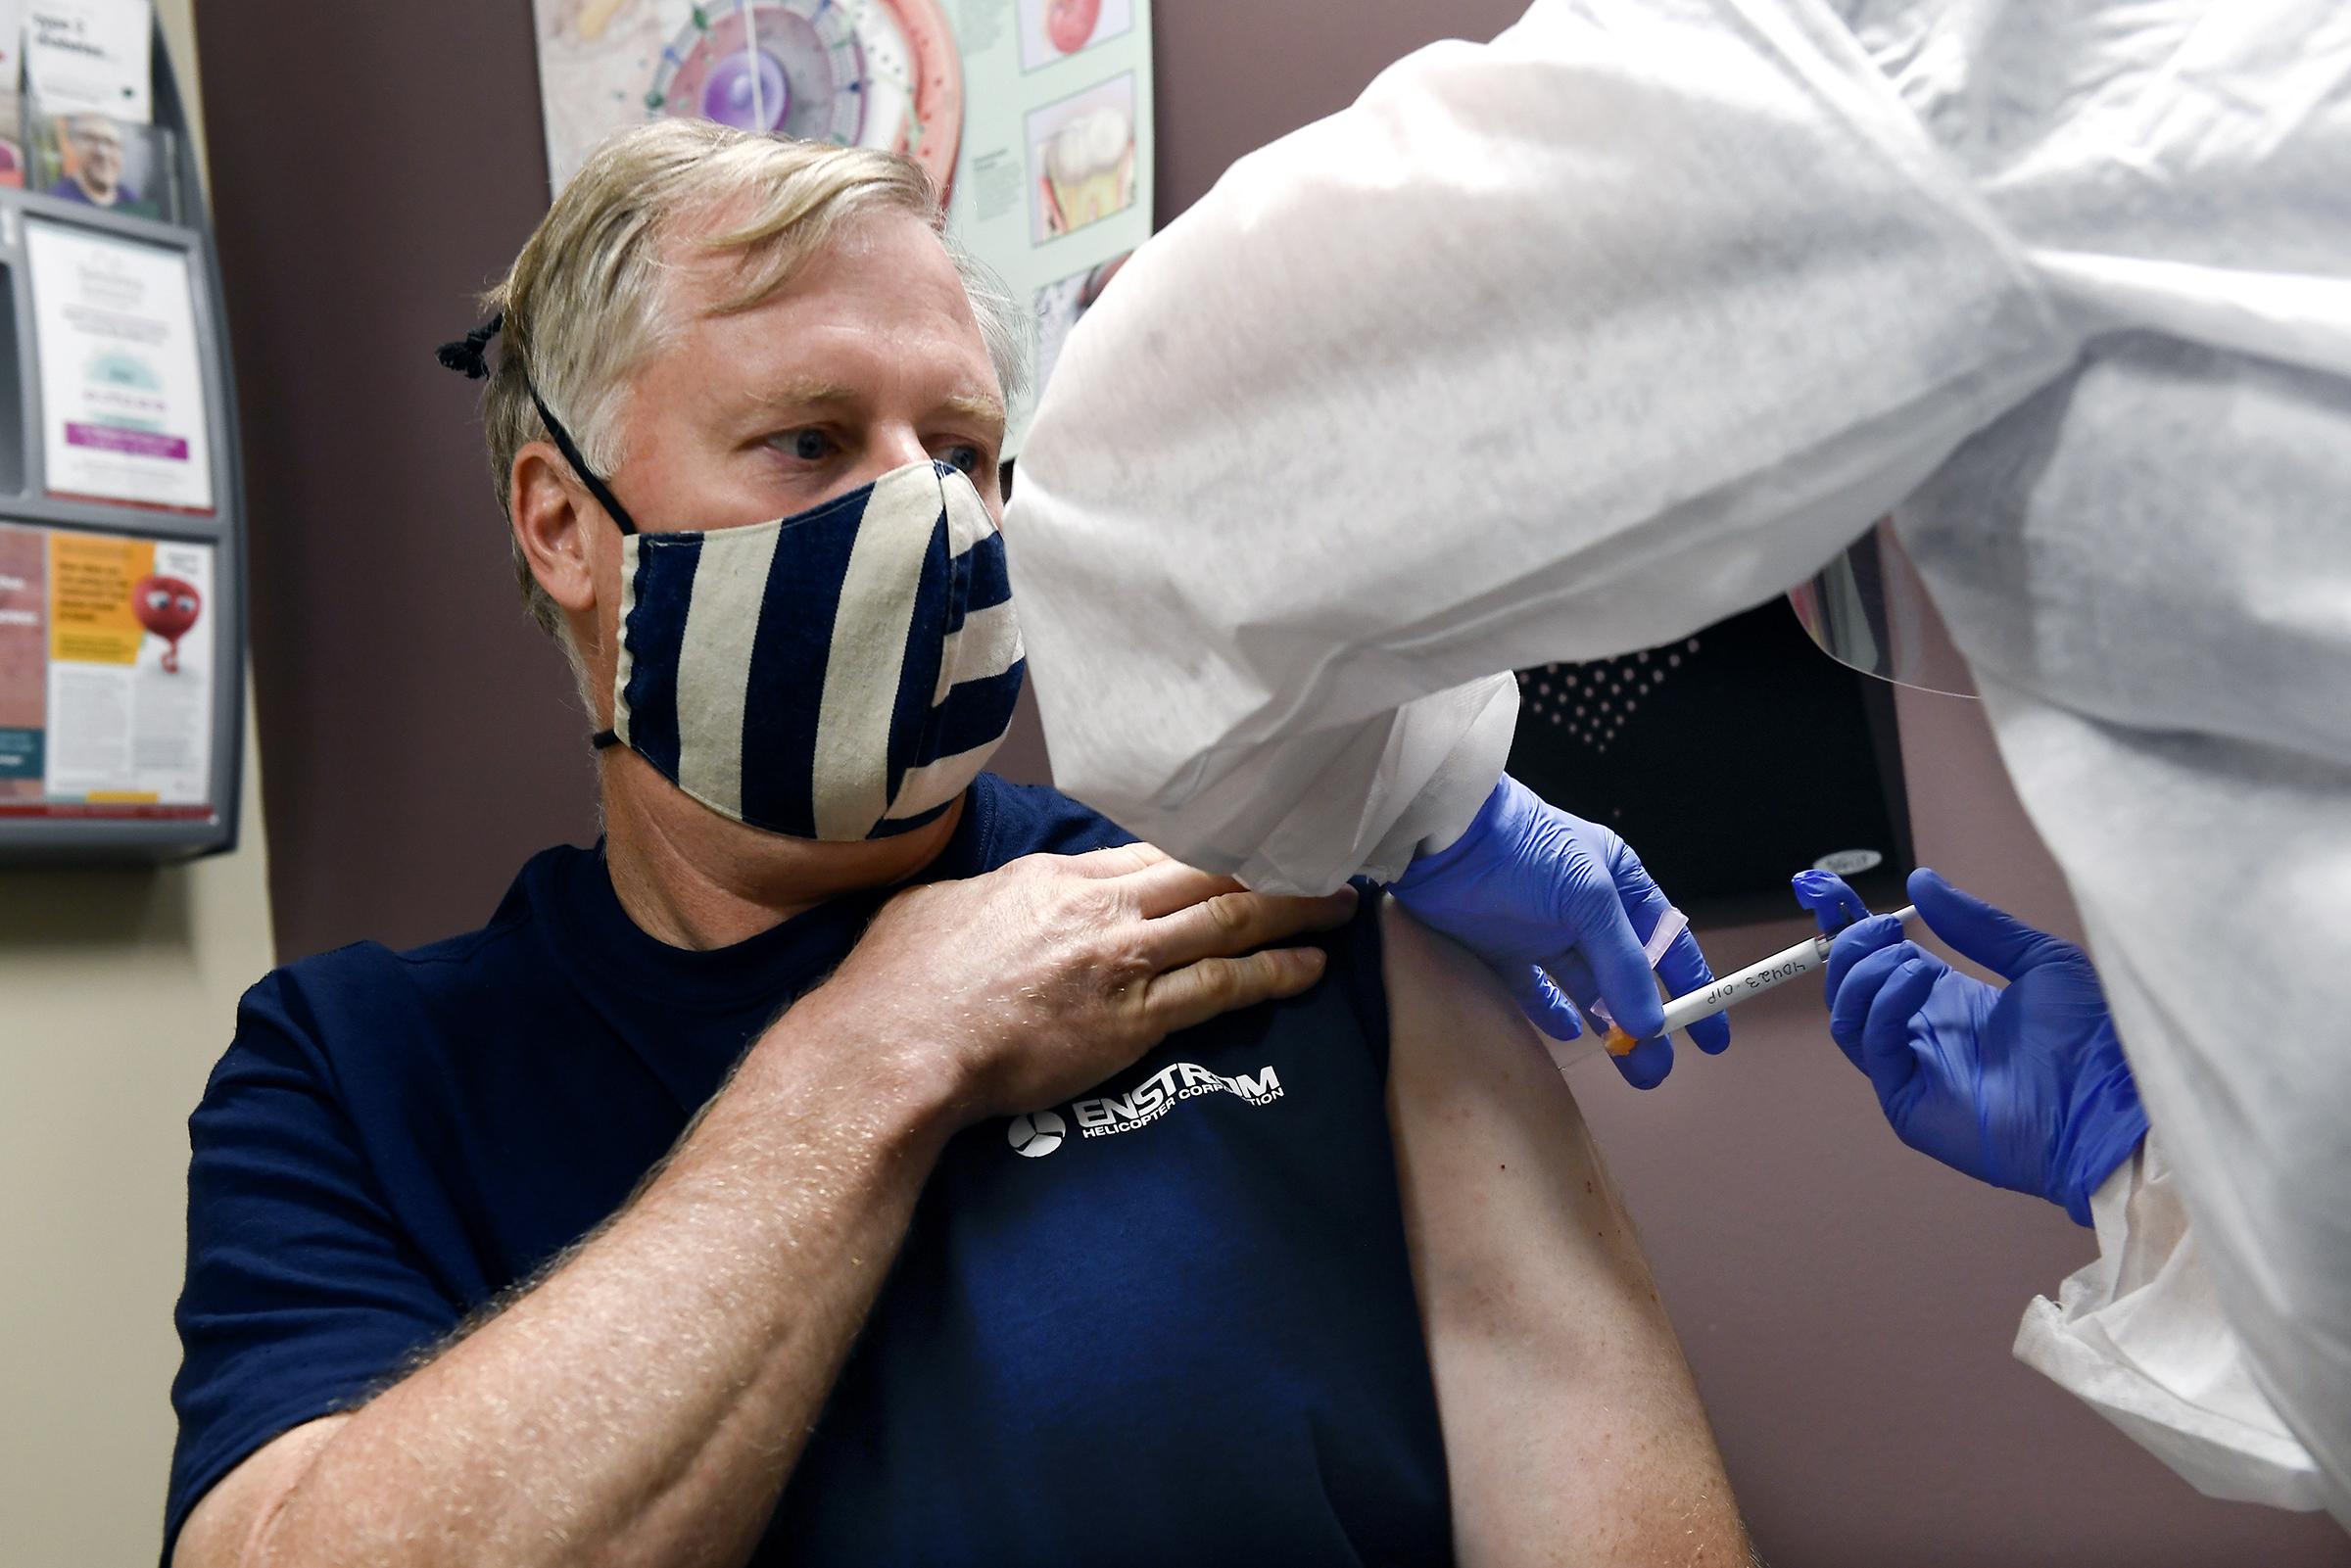 NIAID所長福西證實,科學家正為「人類挑戰試驗」作初步準備,正考慮讓志願者主動感染新冠病毒,從而加快疫苗的研究進度。     美聯社